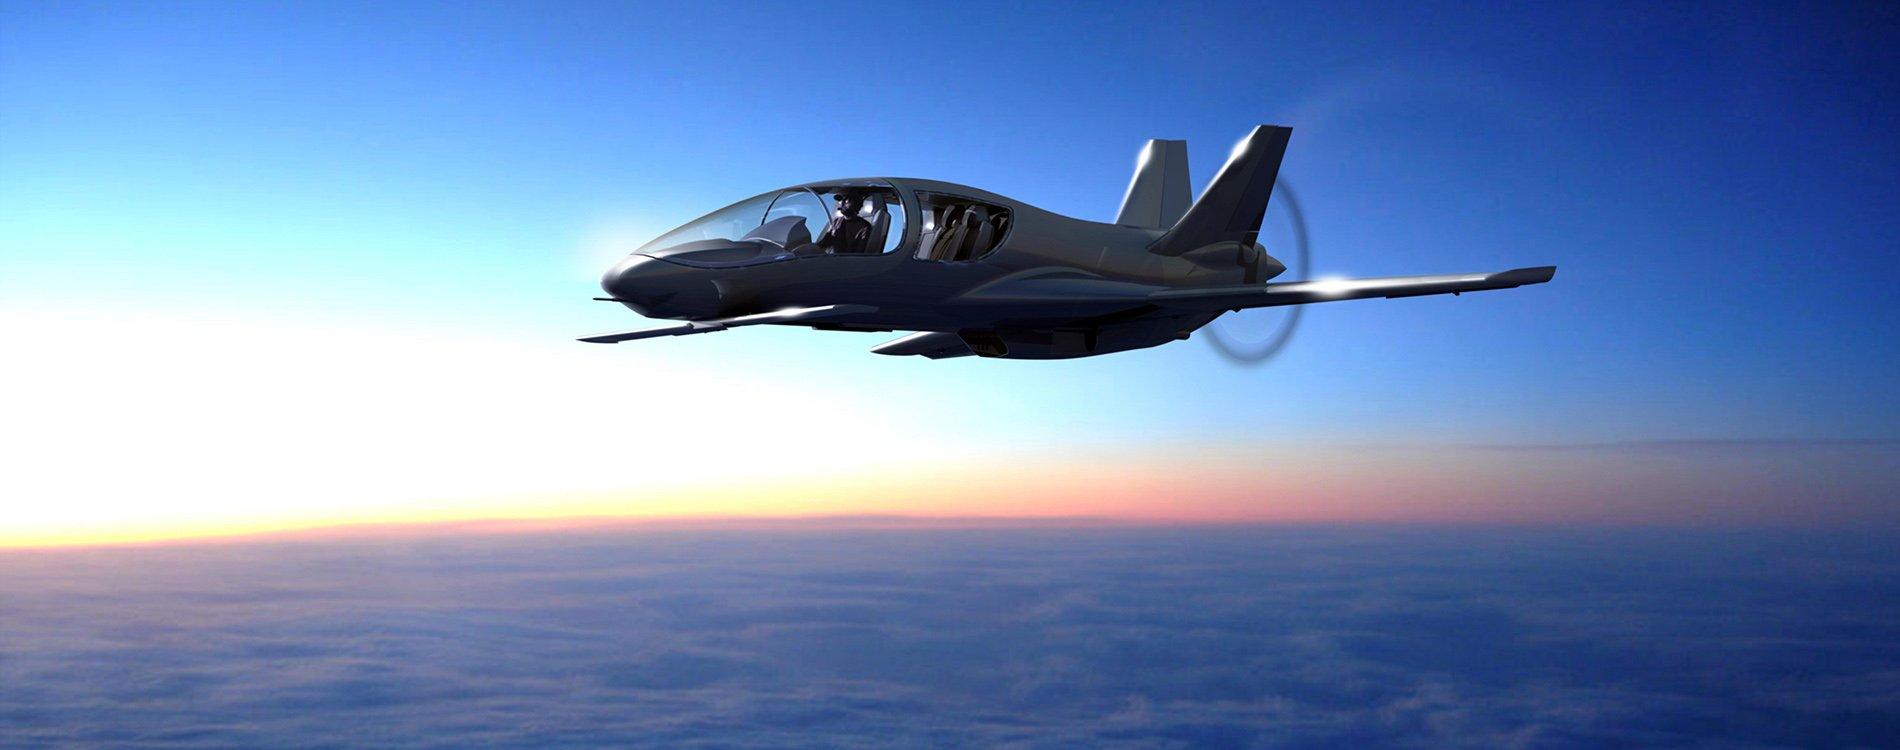 coder un jet de d233